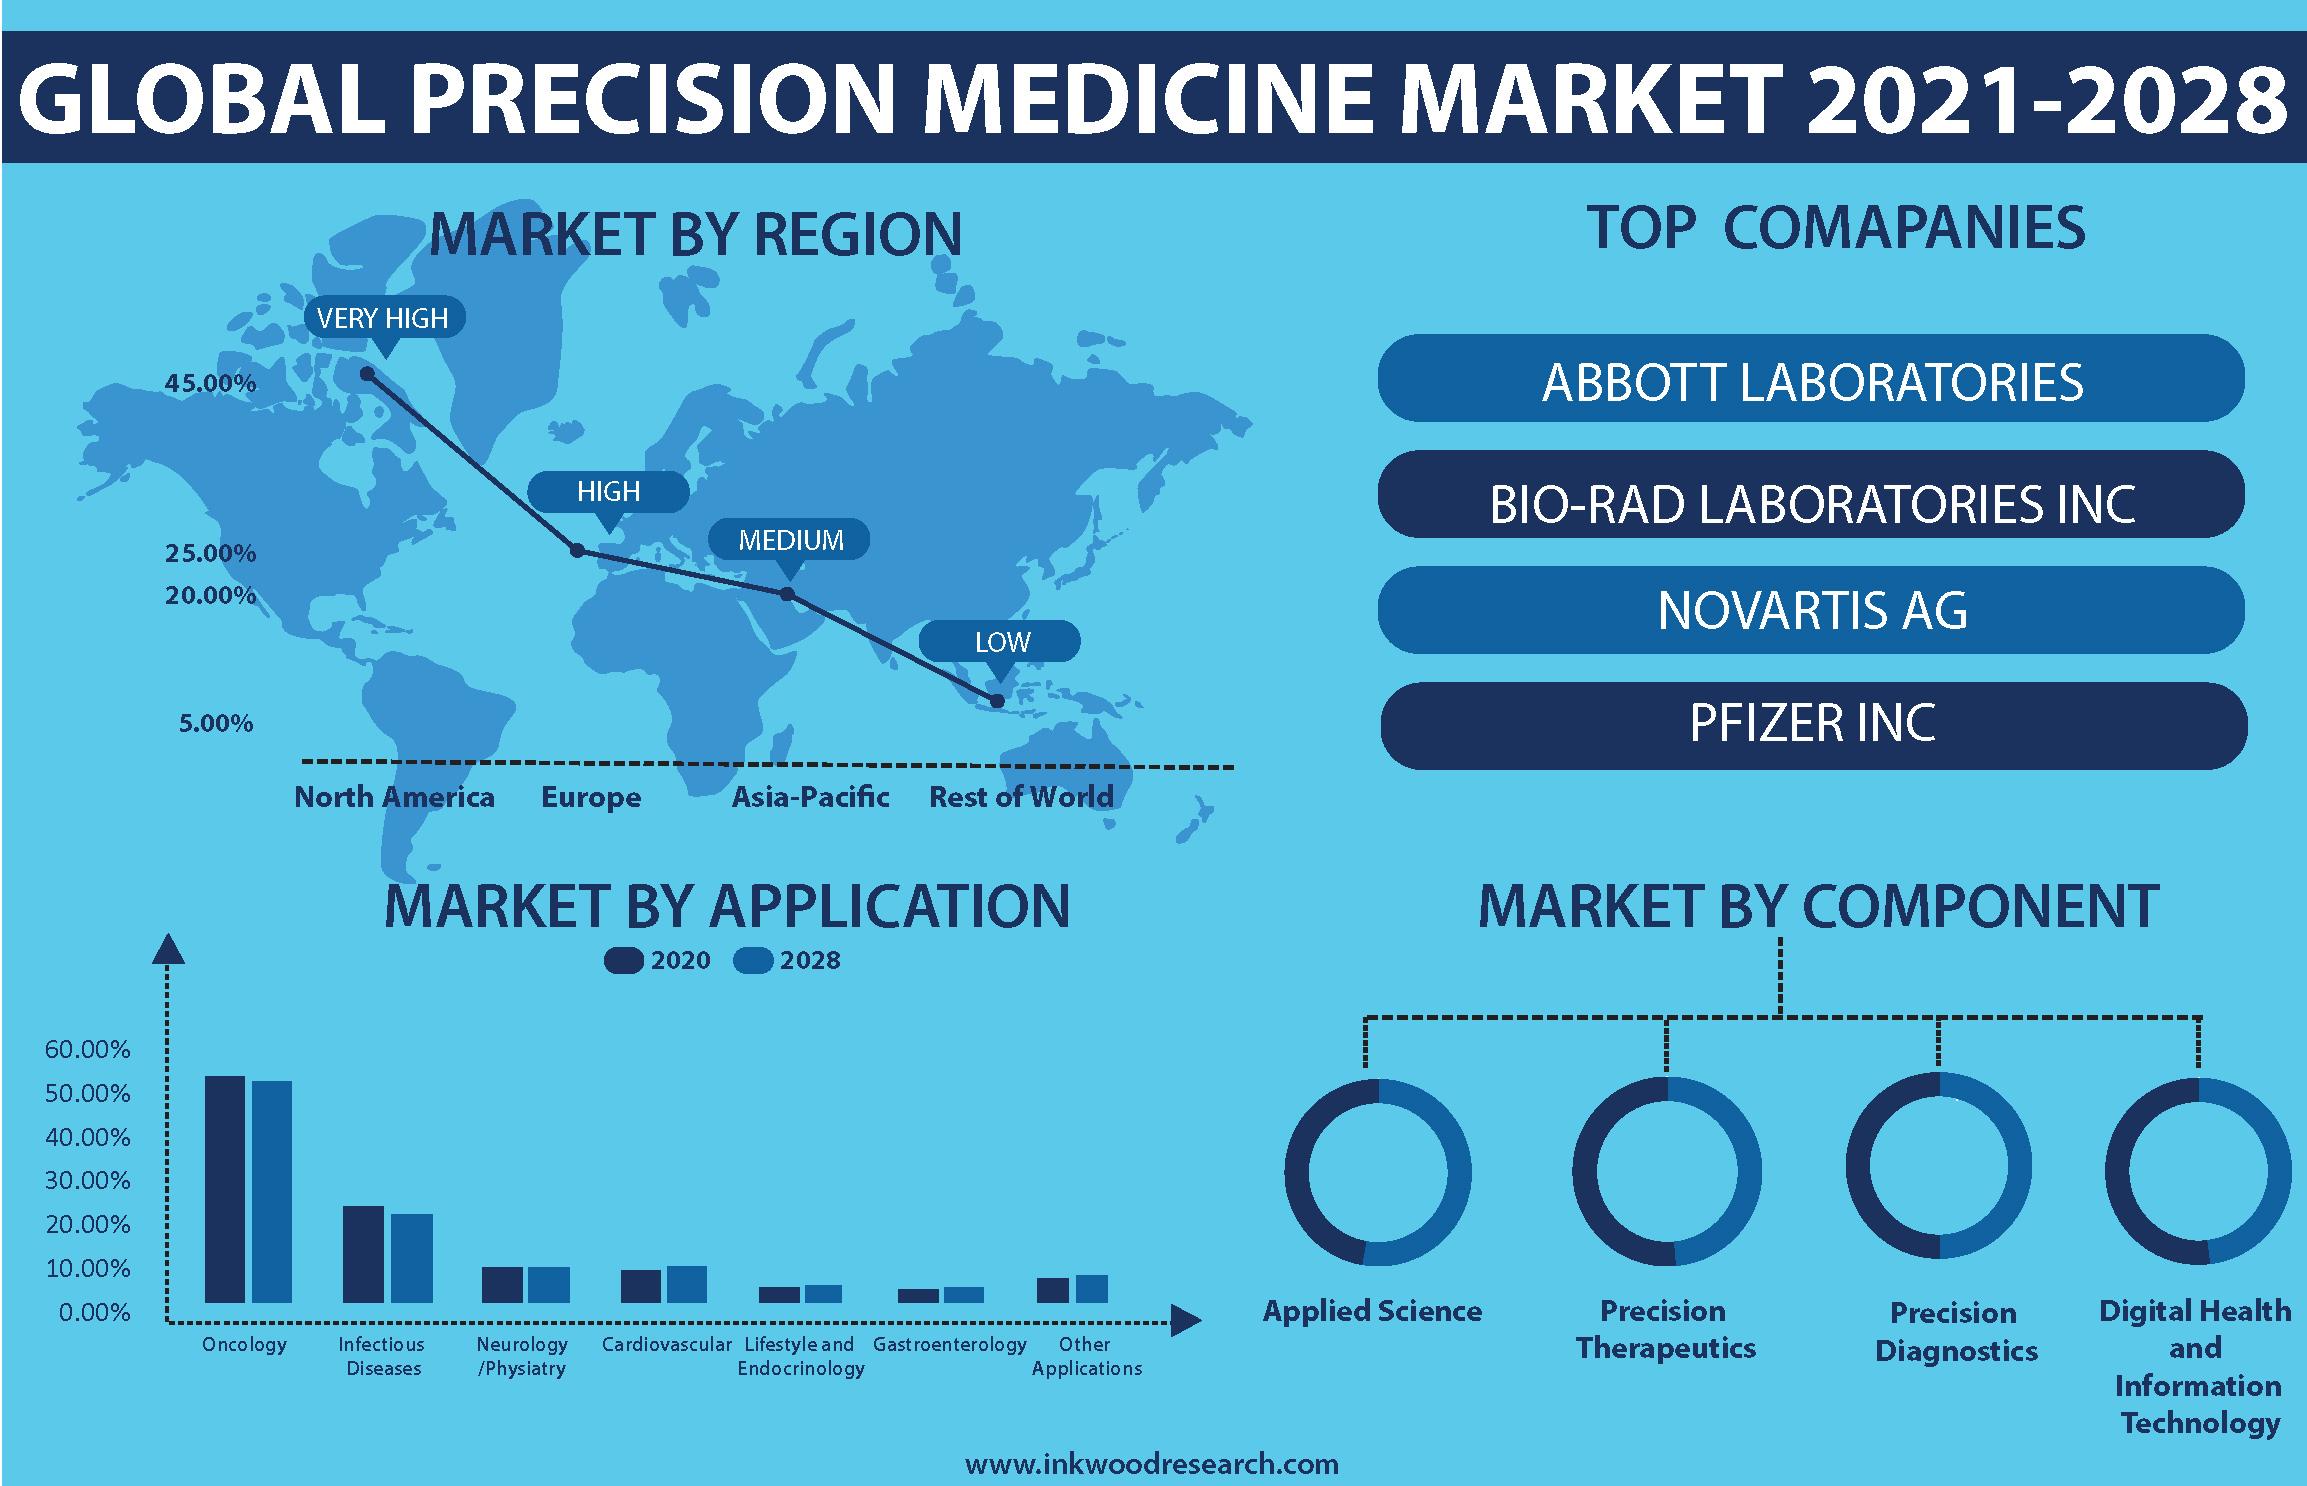 Global Precision Medicine Market has hiked Demand for Preventive Care